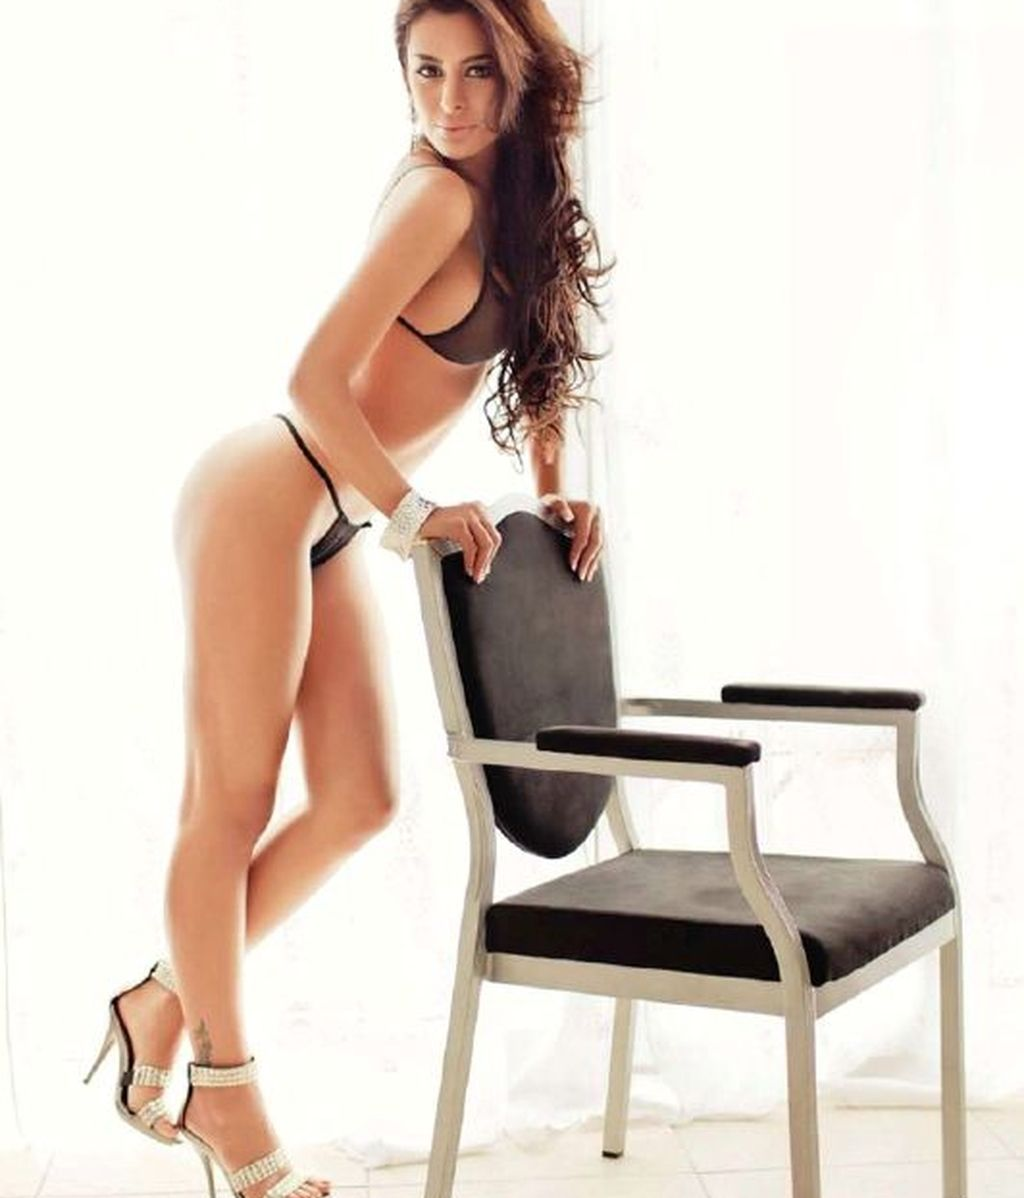 El desnudo mexicano de Larissa Riquelme